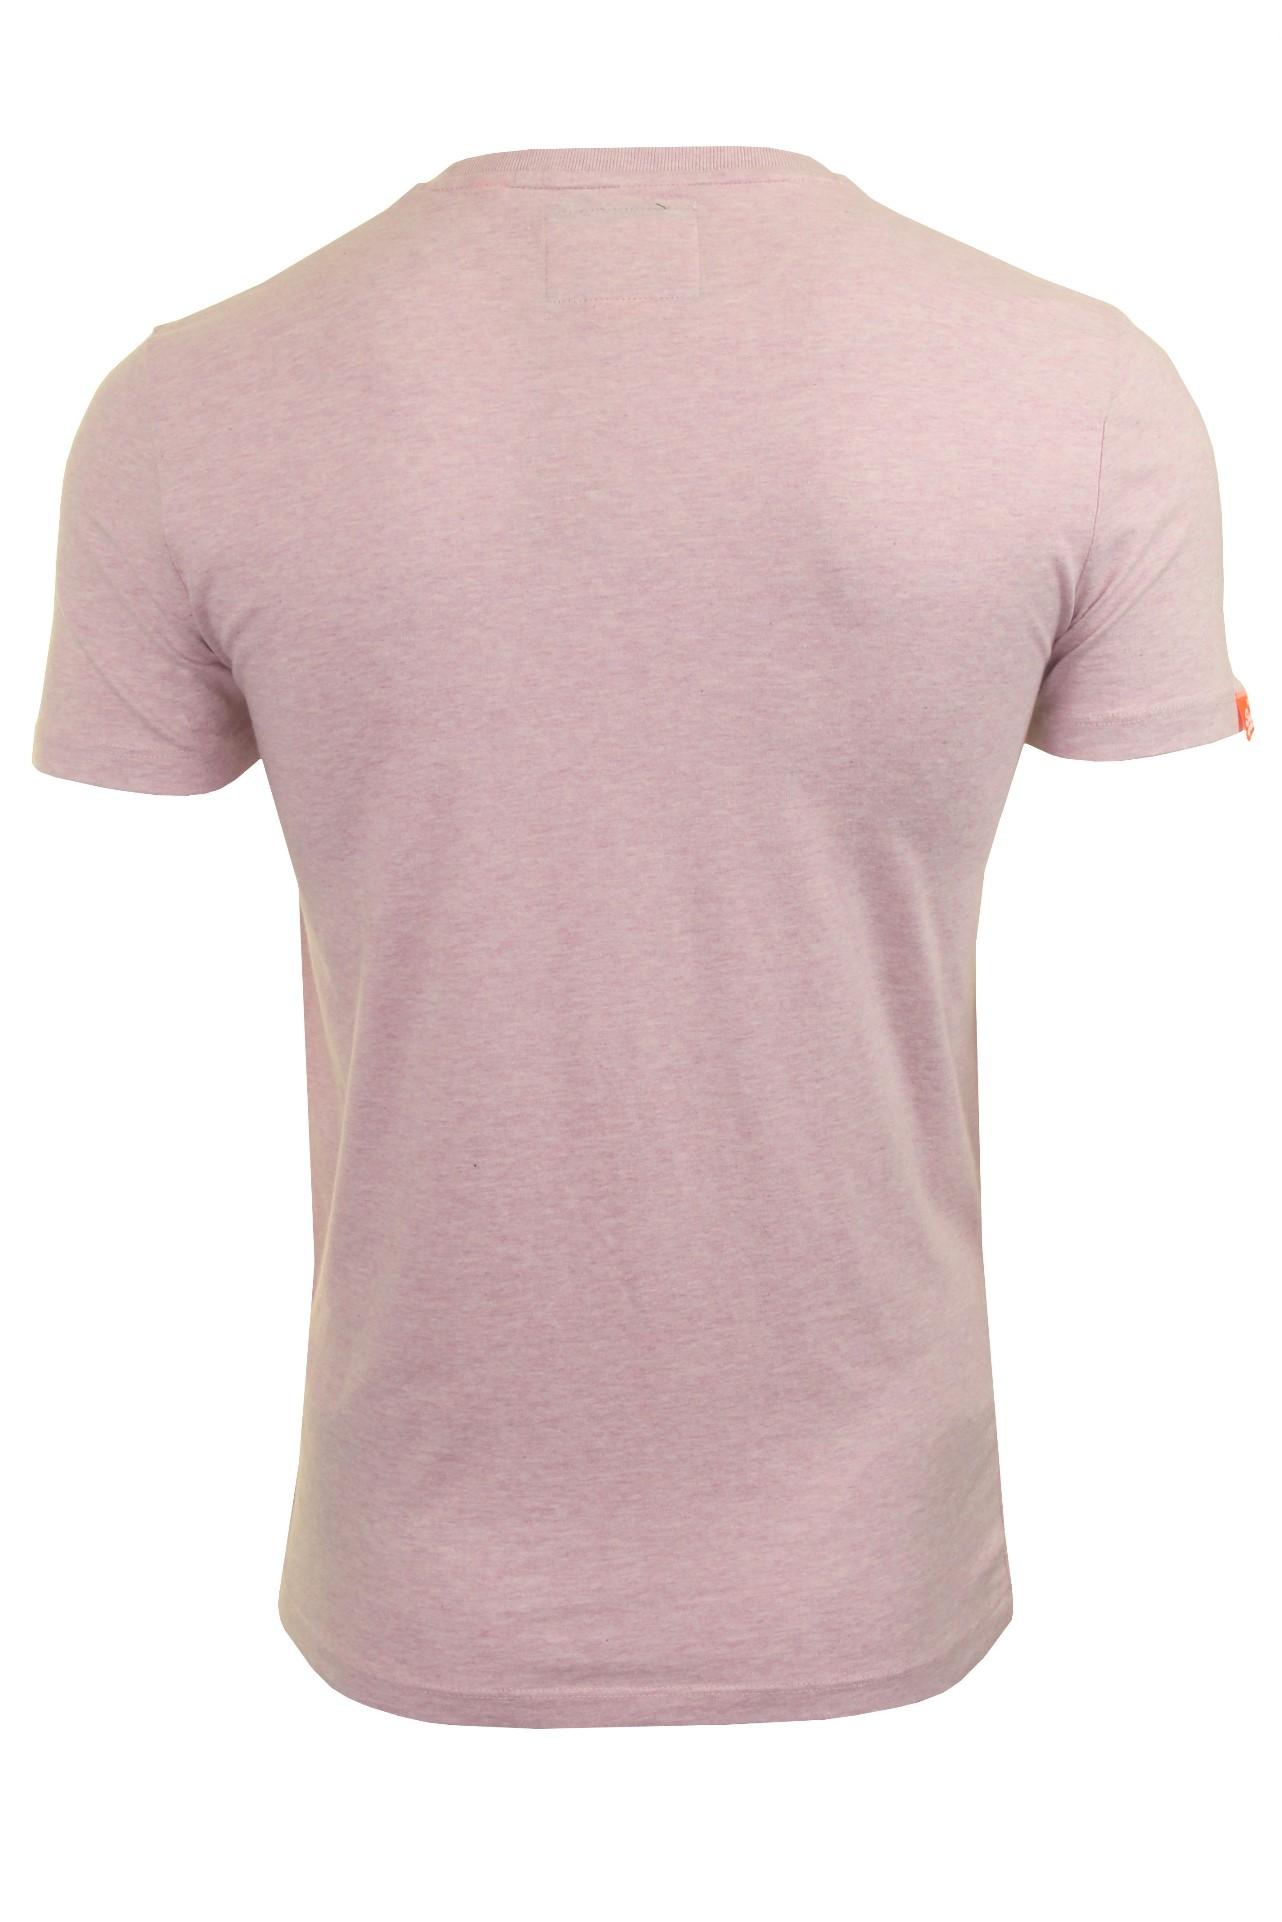 Superdry Mens /'Vintage Embroidery/' Short Sleeved T-Shirt